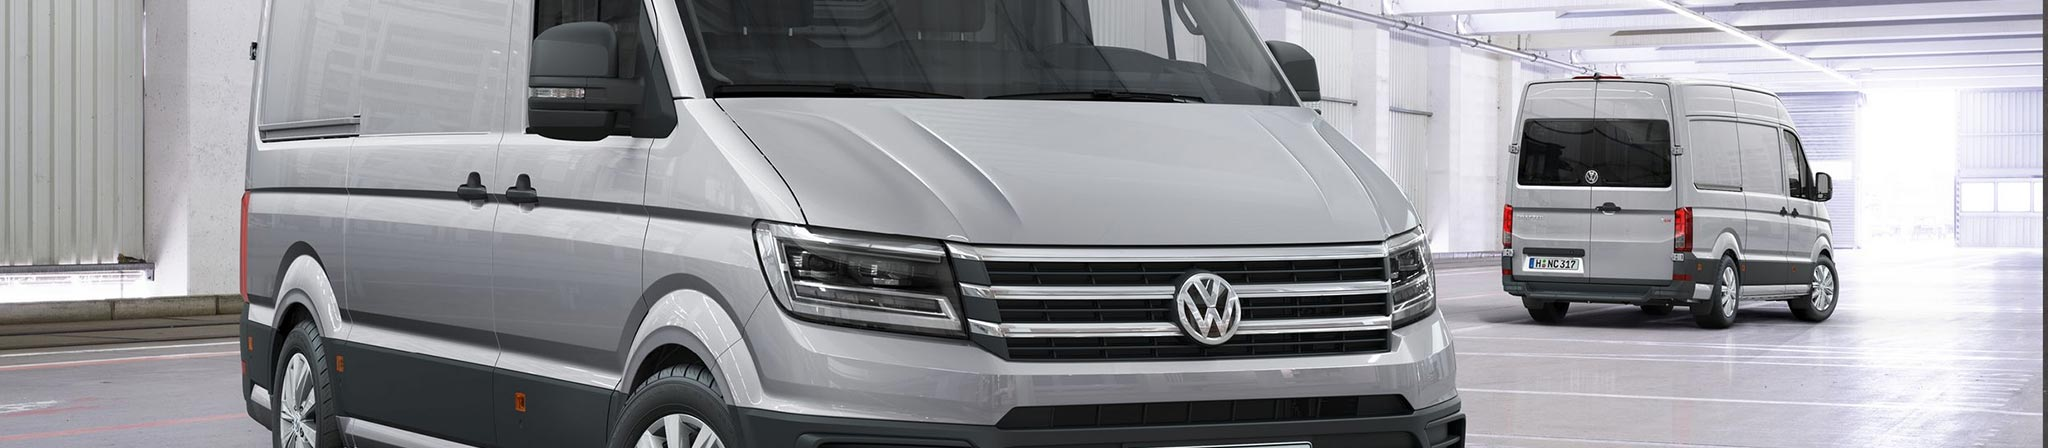 Volkswagen Crafter 2017 — больше не Меrcedes-Benz